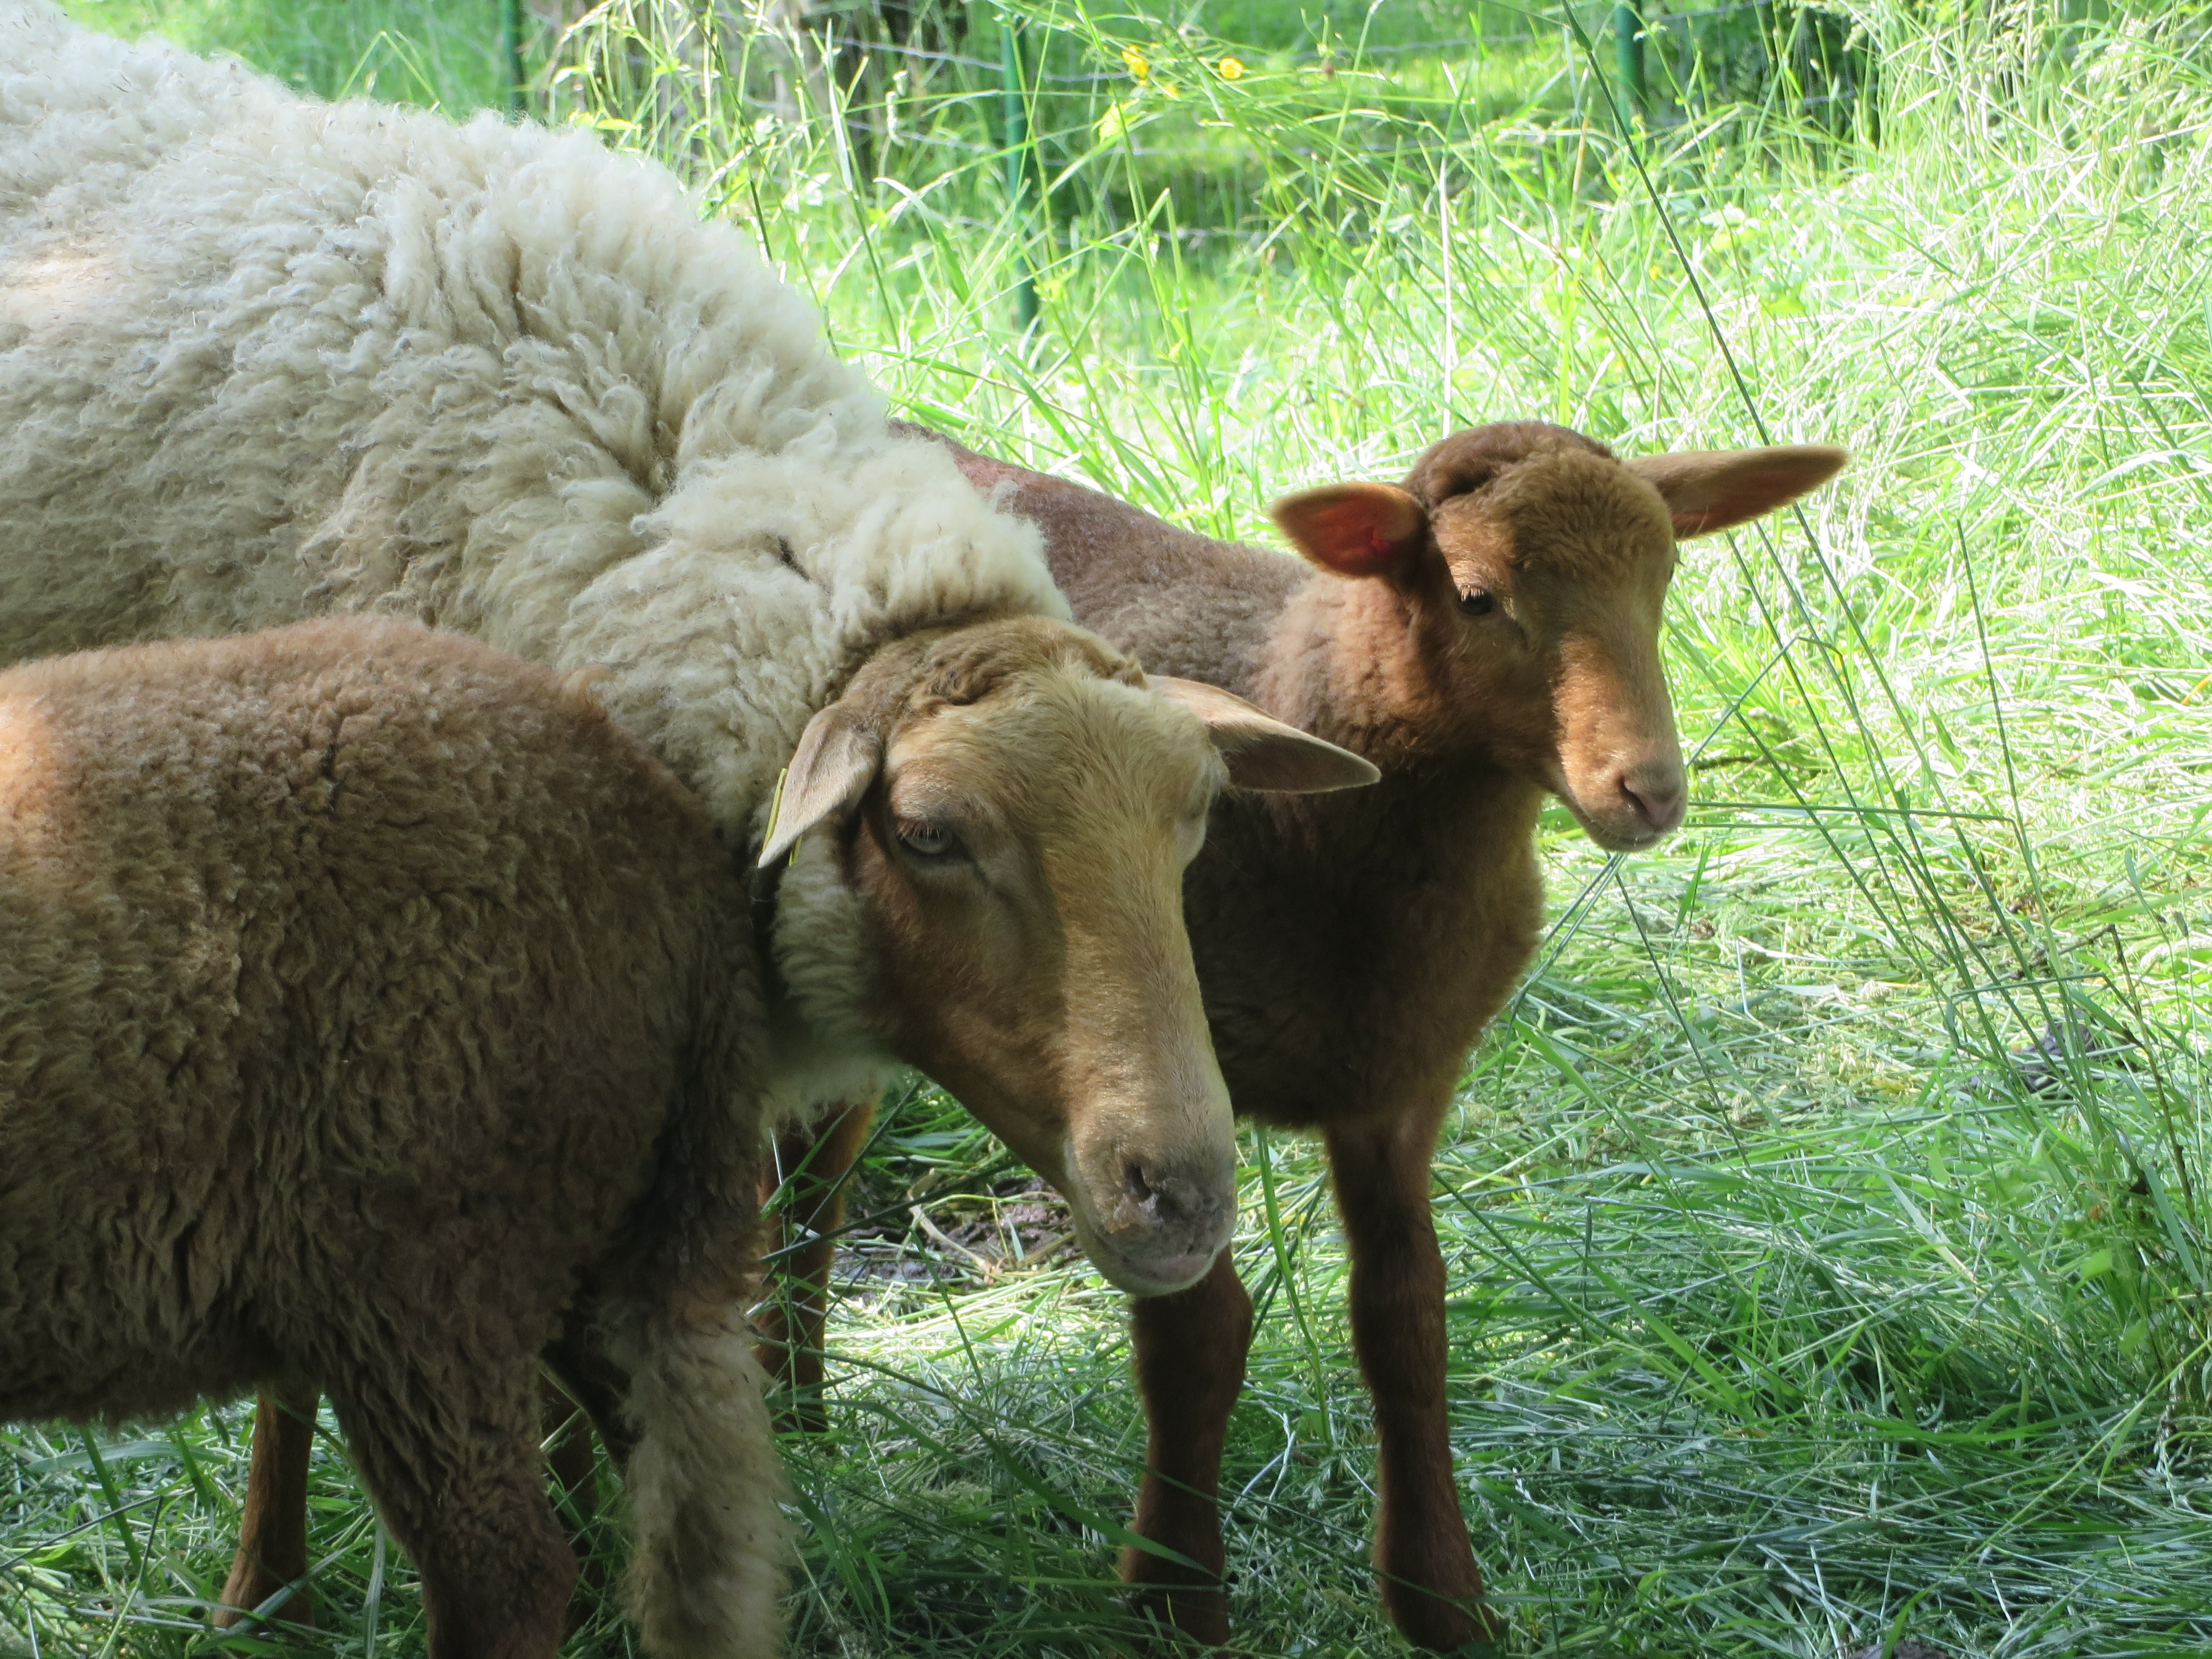 The German Sheep | Woolyadventures's Blog